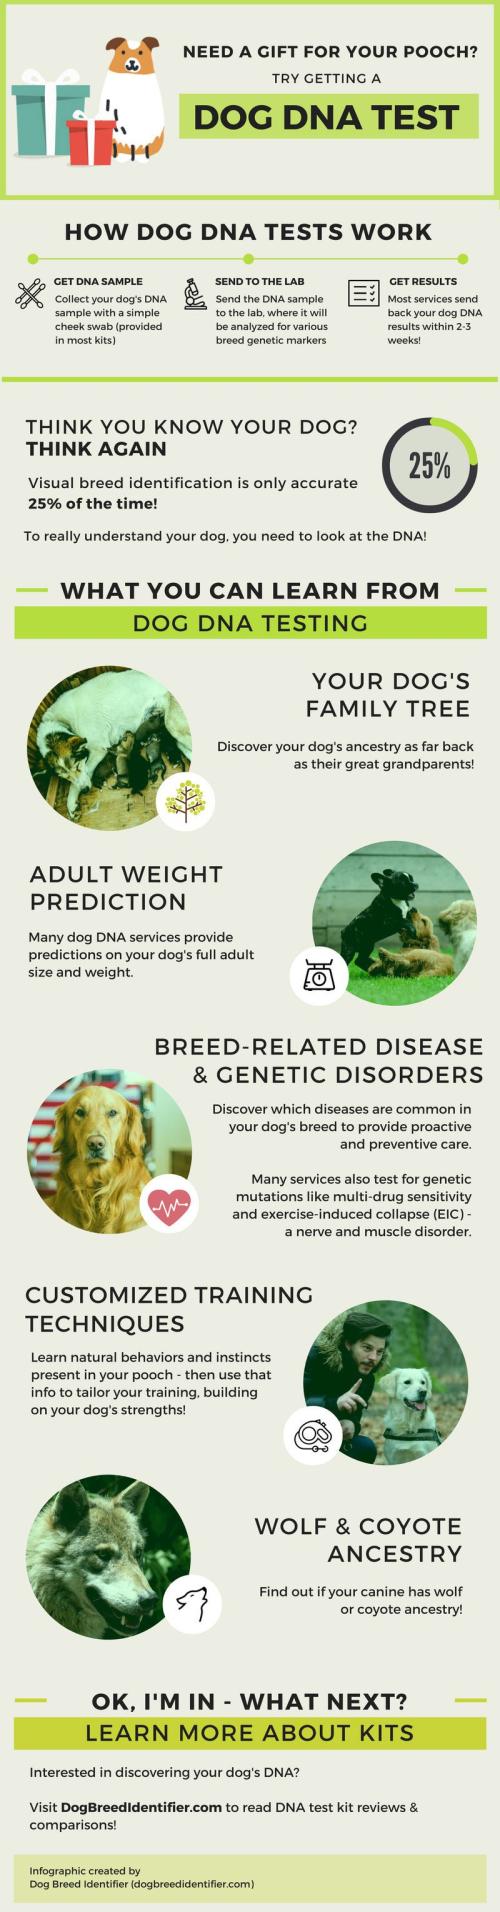 DogBreedDNA-Infographic-Full (1)